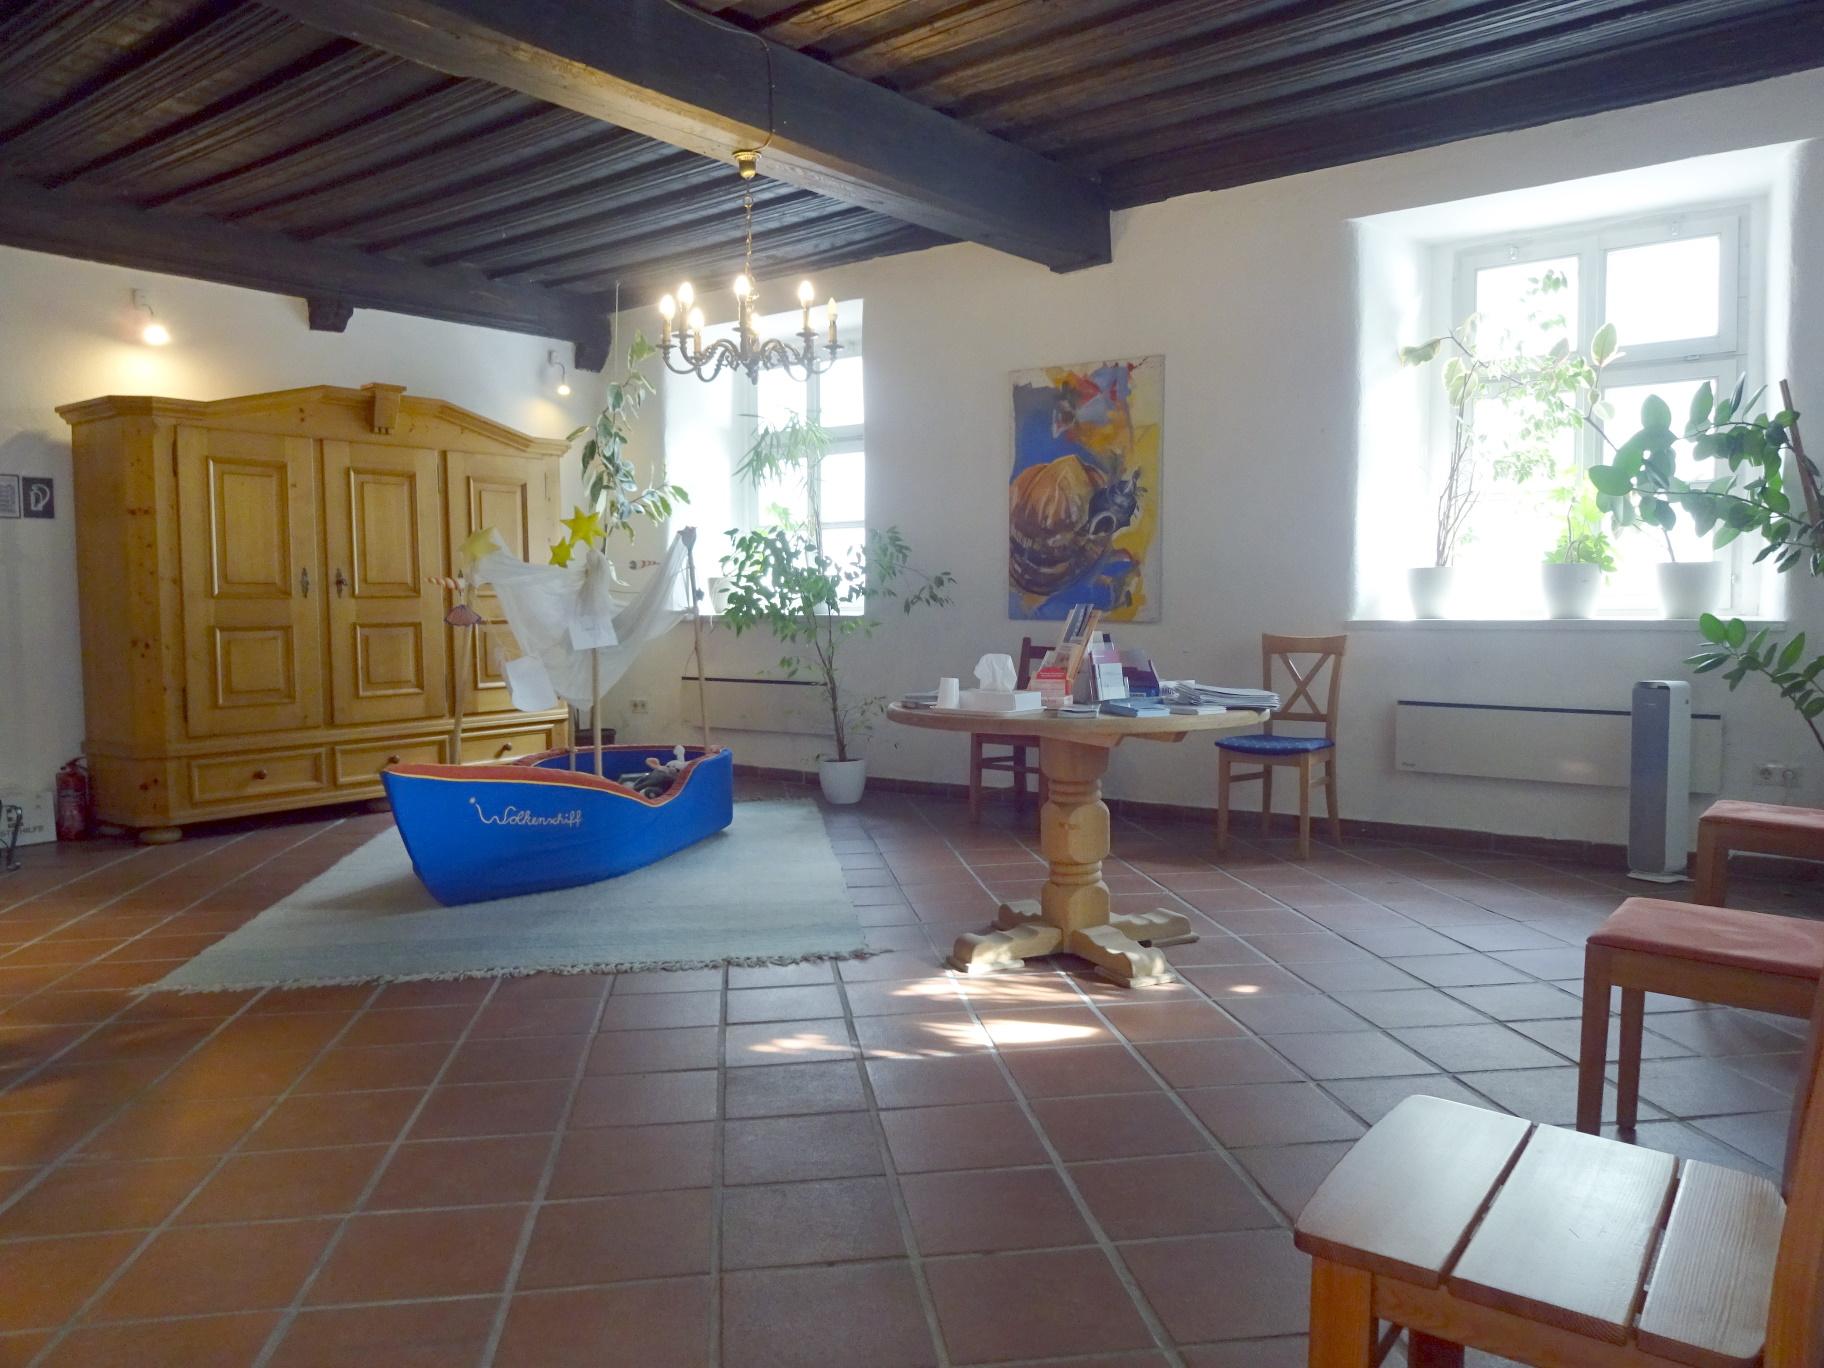 Ordination praxisgemeinschaft schottwien neunkirchen wohntraum immobilien